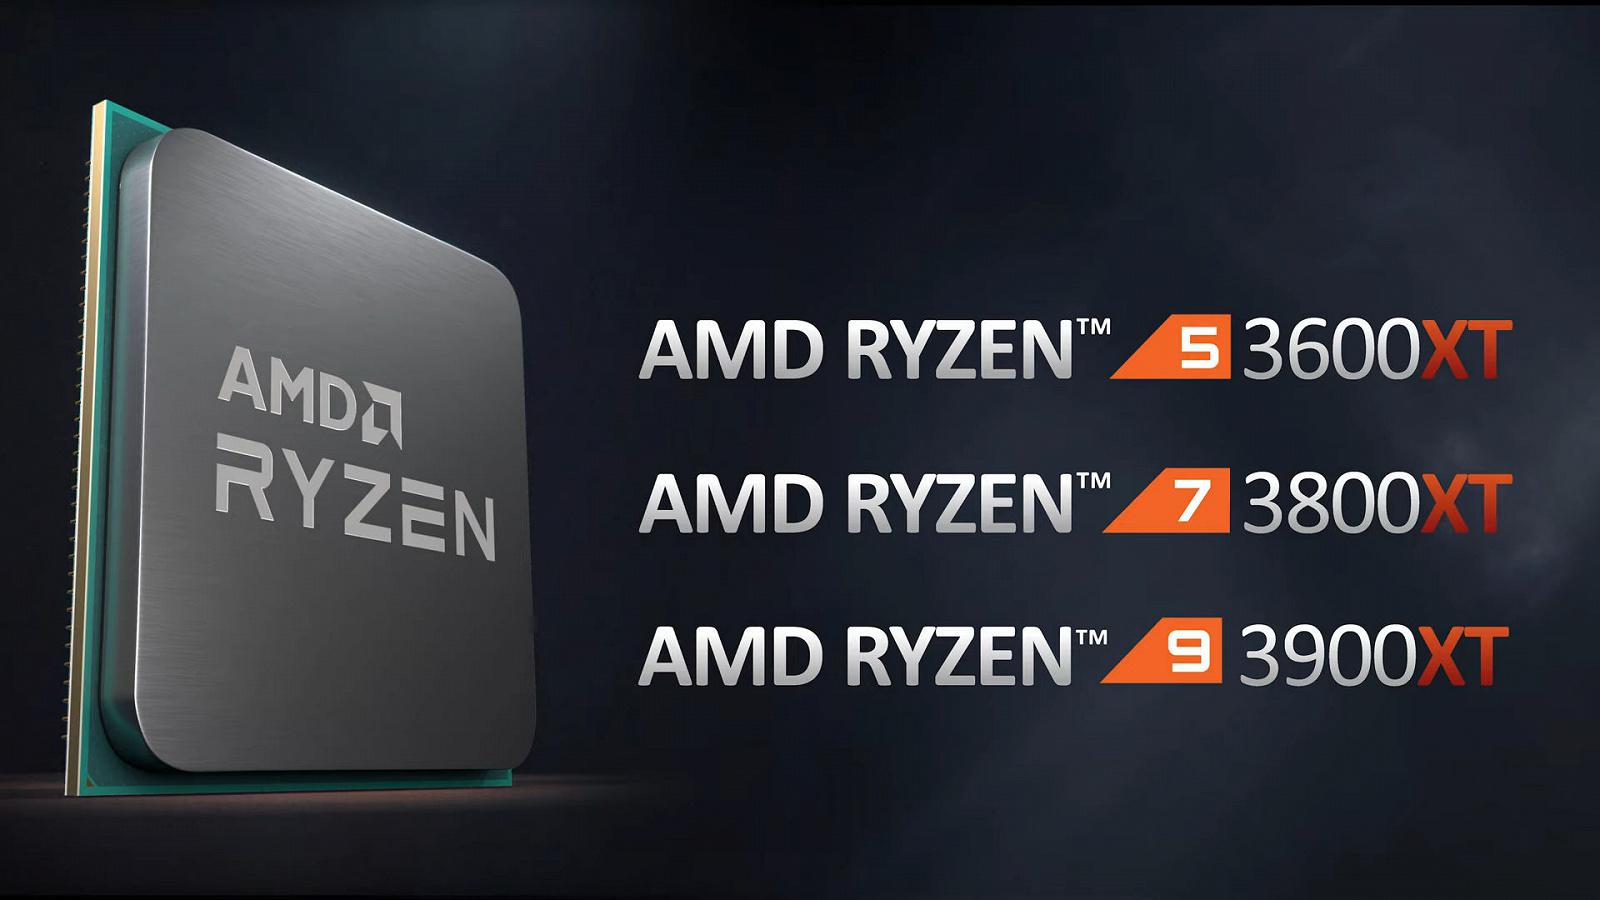 AMD представила процессоры серии Ryzen 3000XT